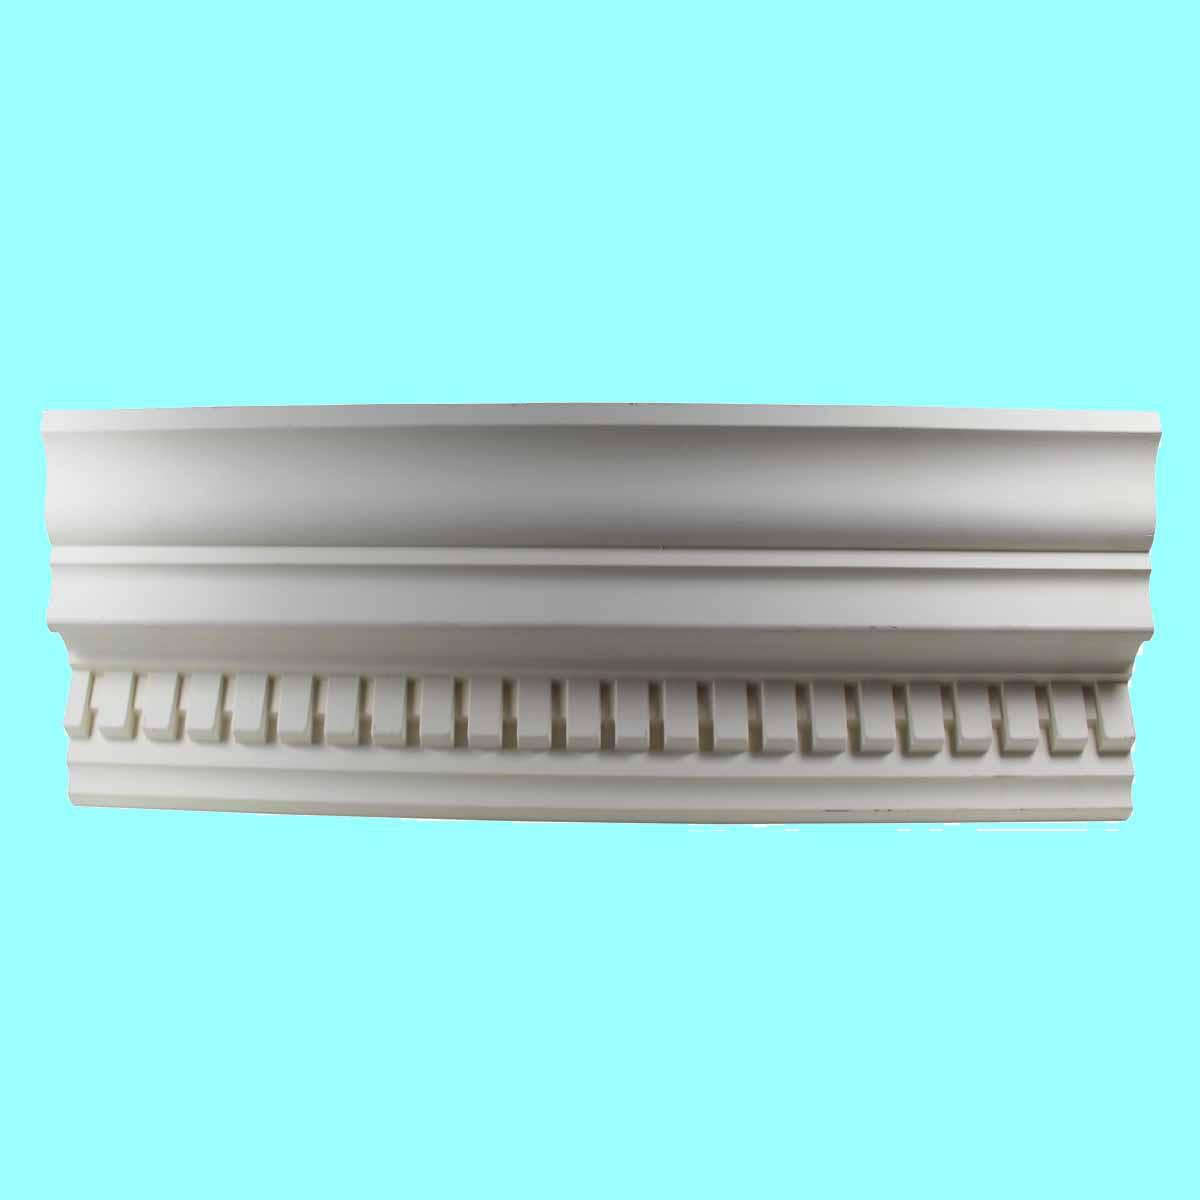 Cornice White Urethane Sample of 11369 23.5 Long Cornice Cornice Moulding Cornice Molding